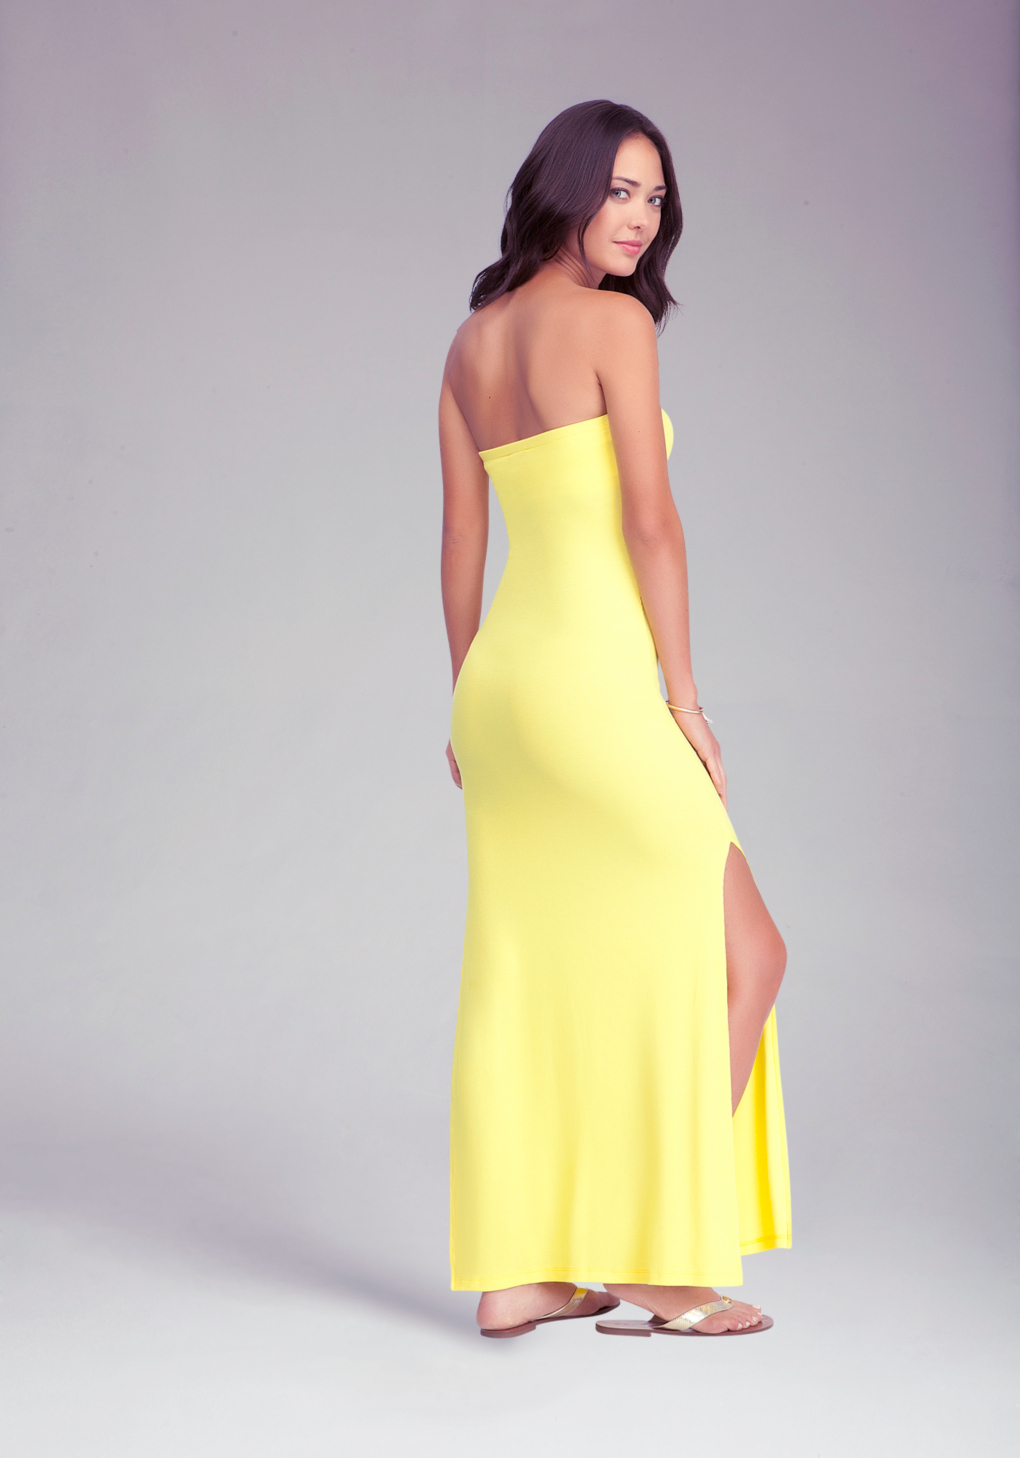 Seamless tube maxi dress